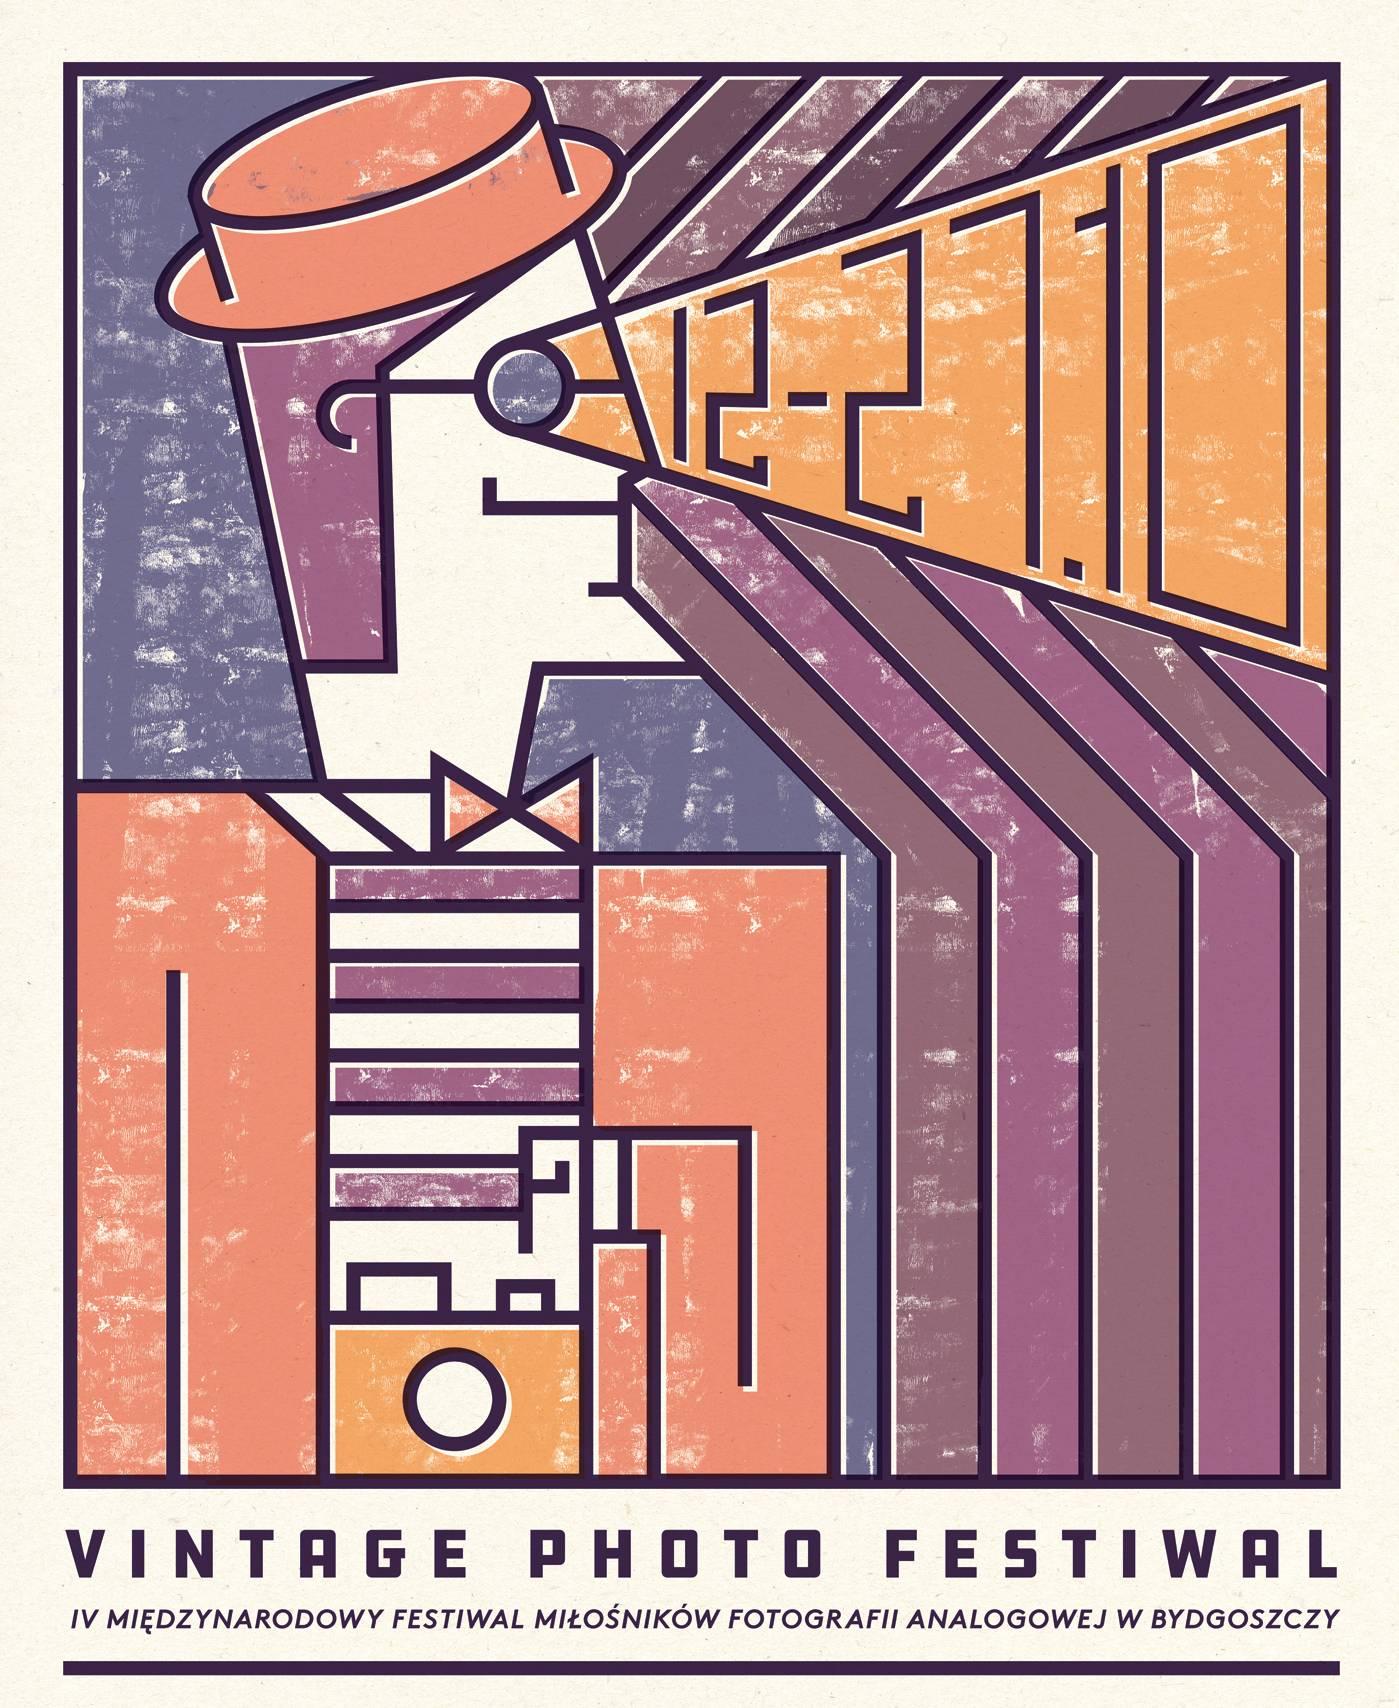 IV Vintage Photo Festival (źródło: materiały prasowe organizatora)